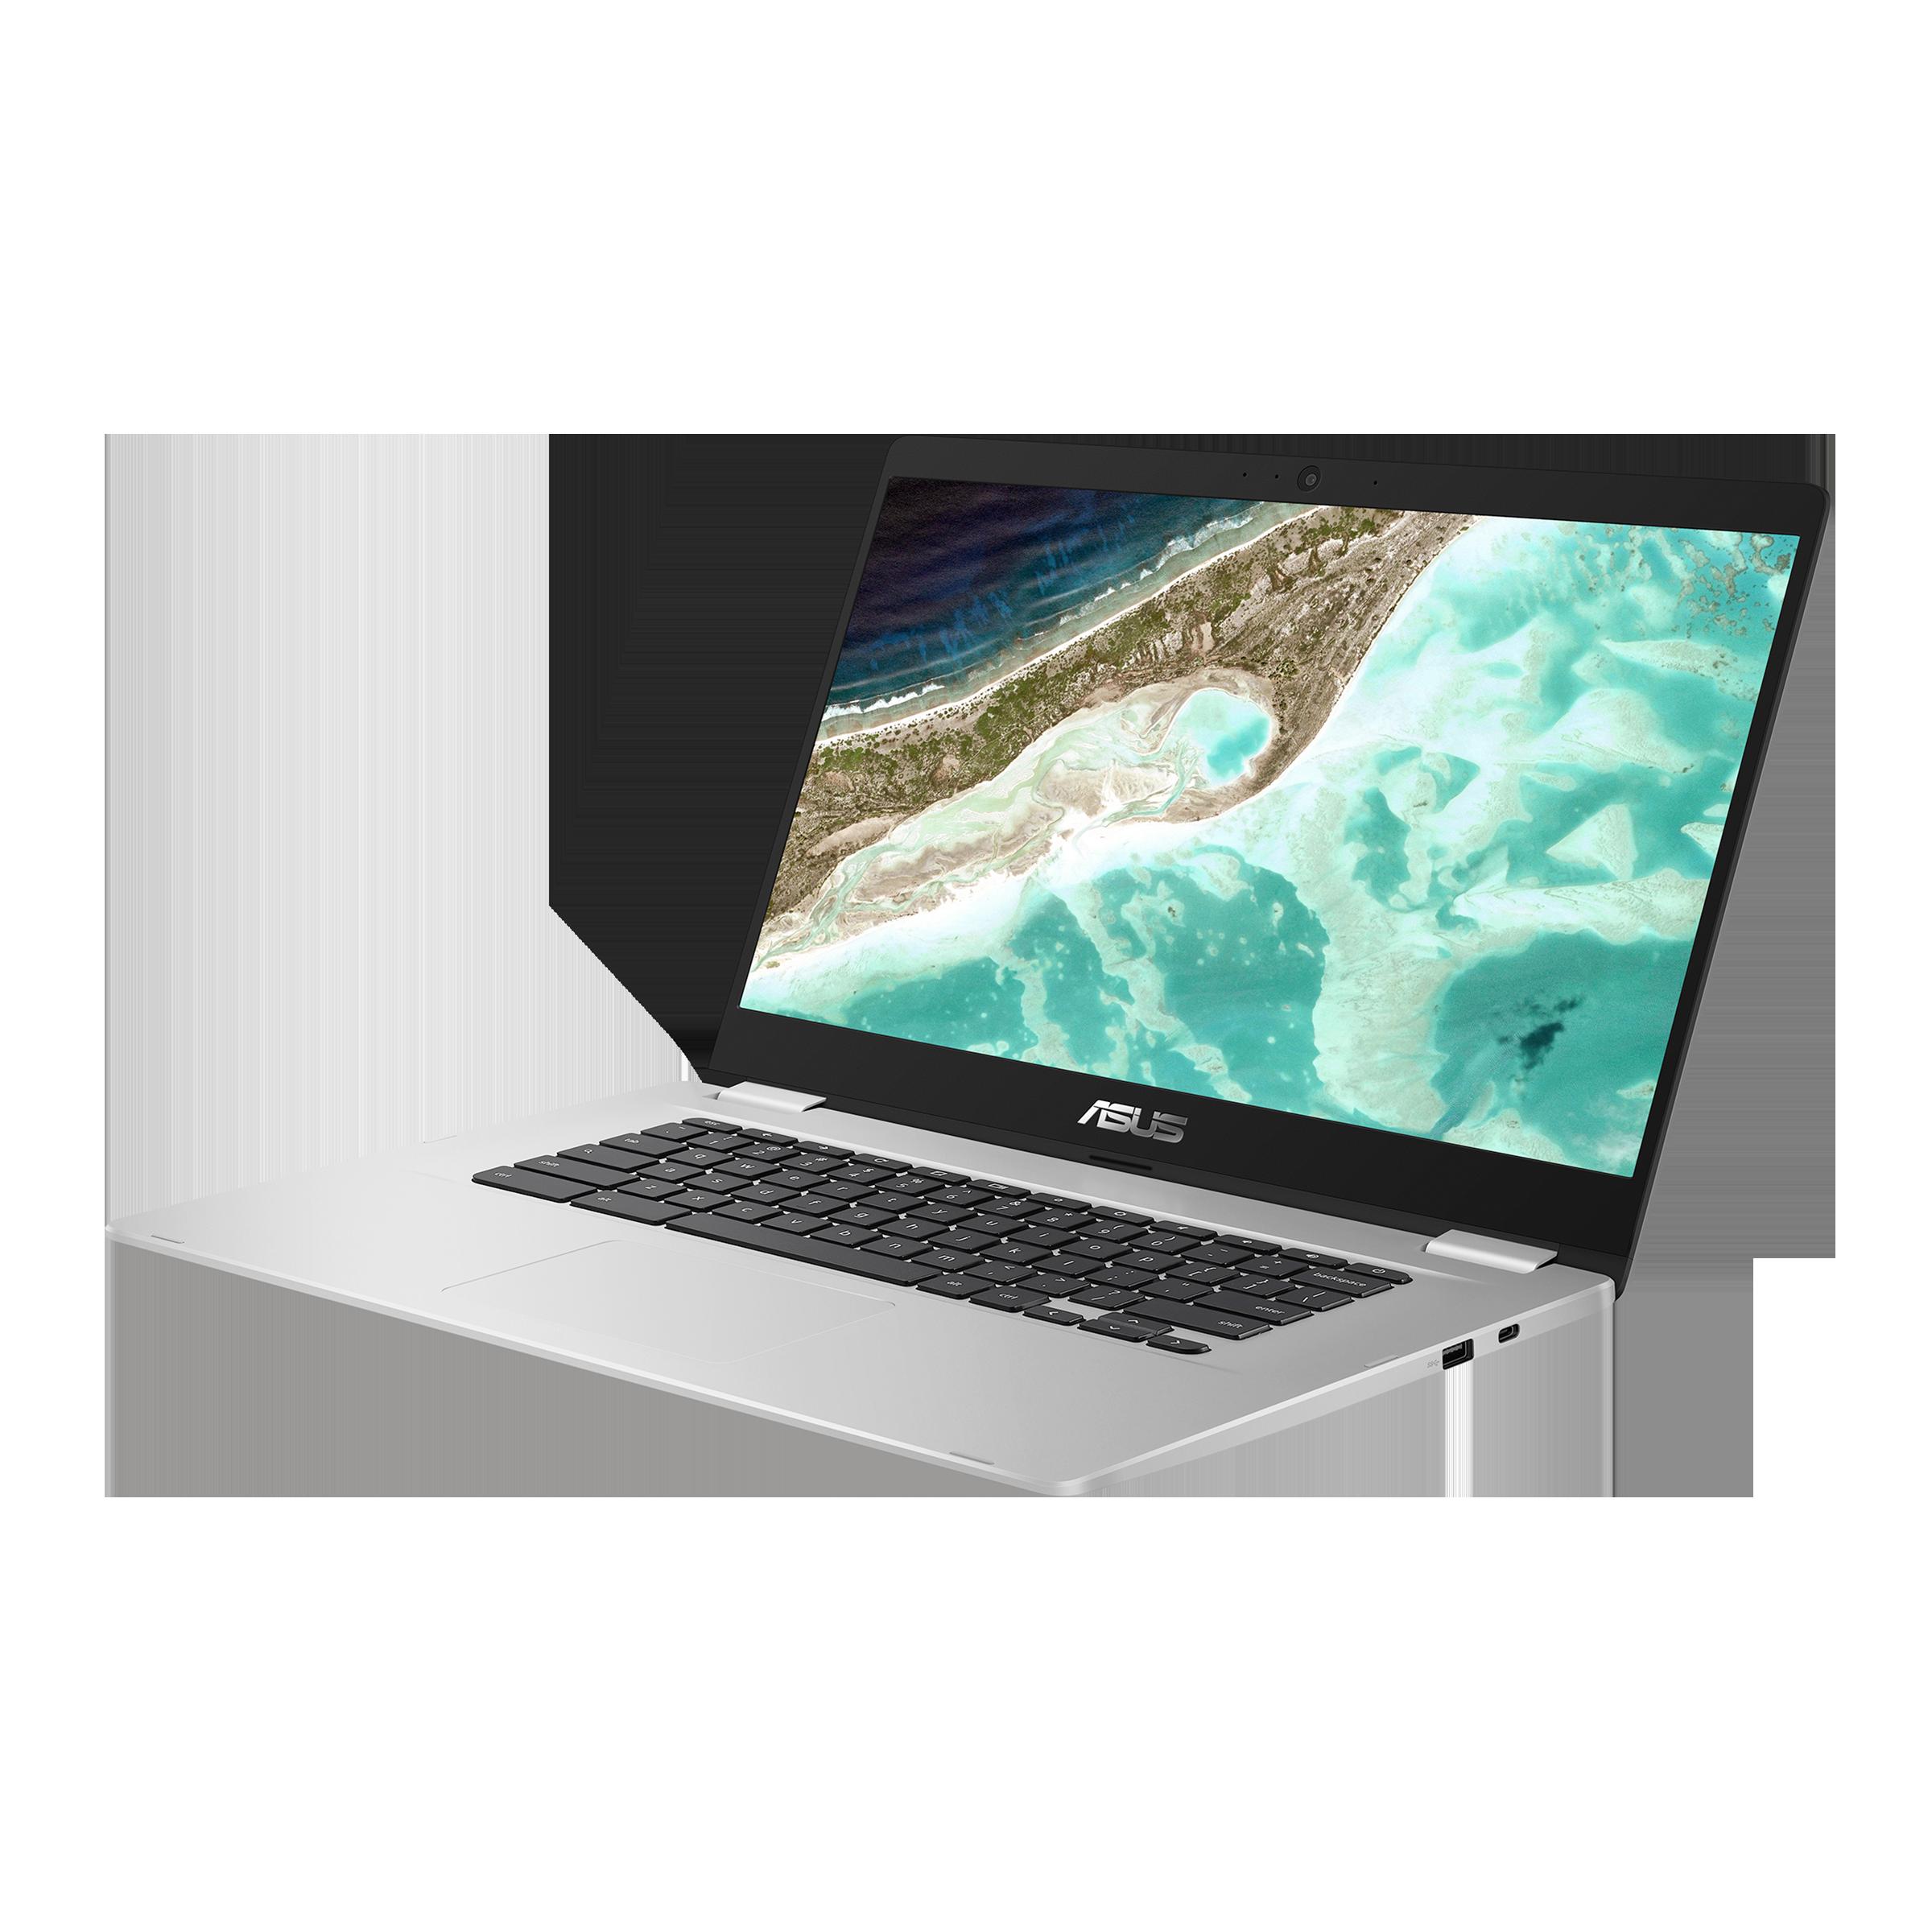 ASUS Chromebook C523|Laptops For Work|ASUS Global